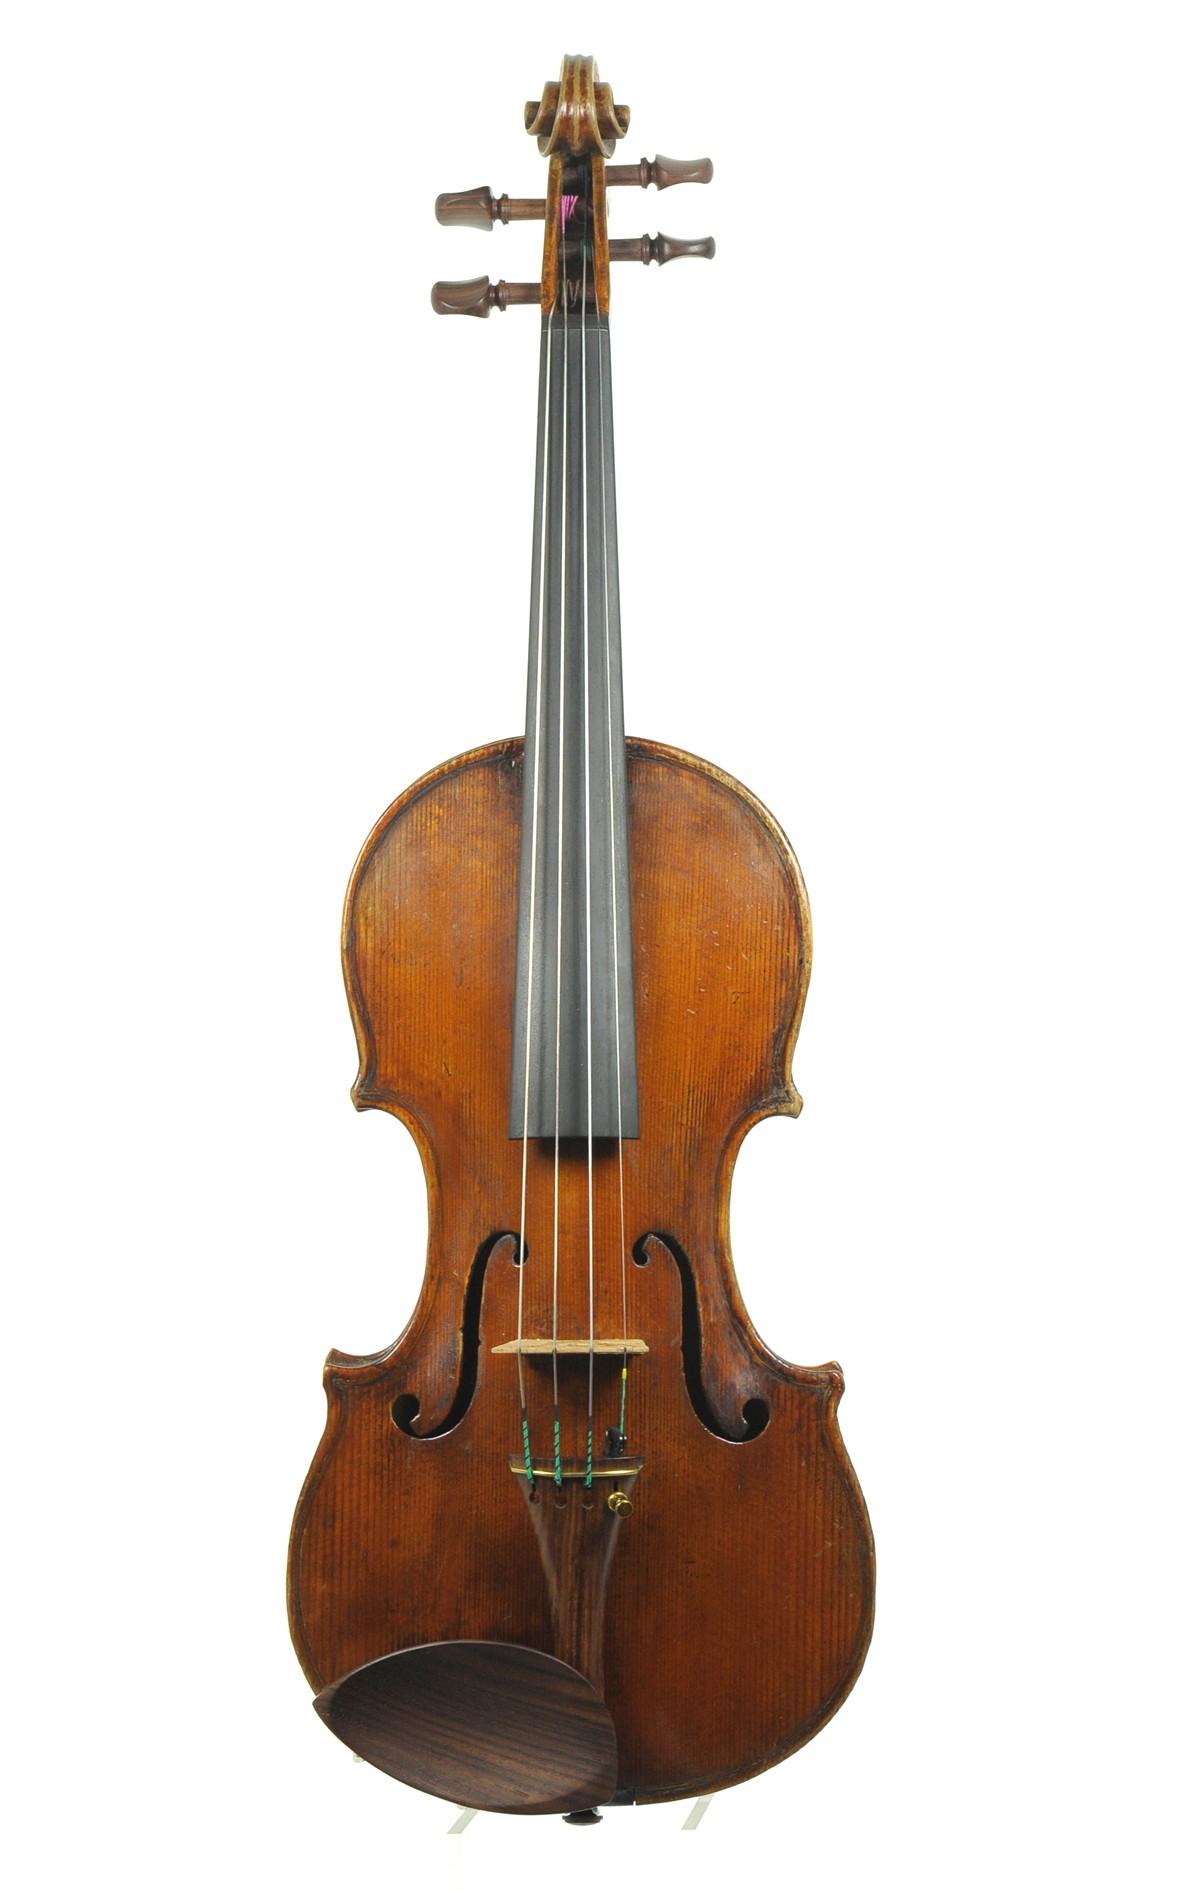 18th century Italian violin